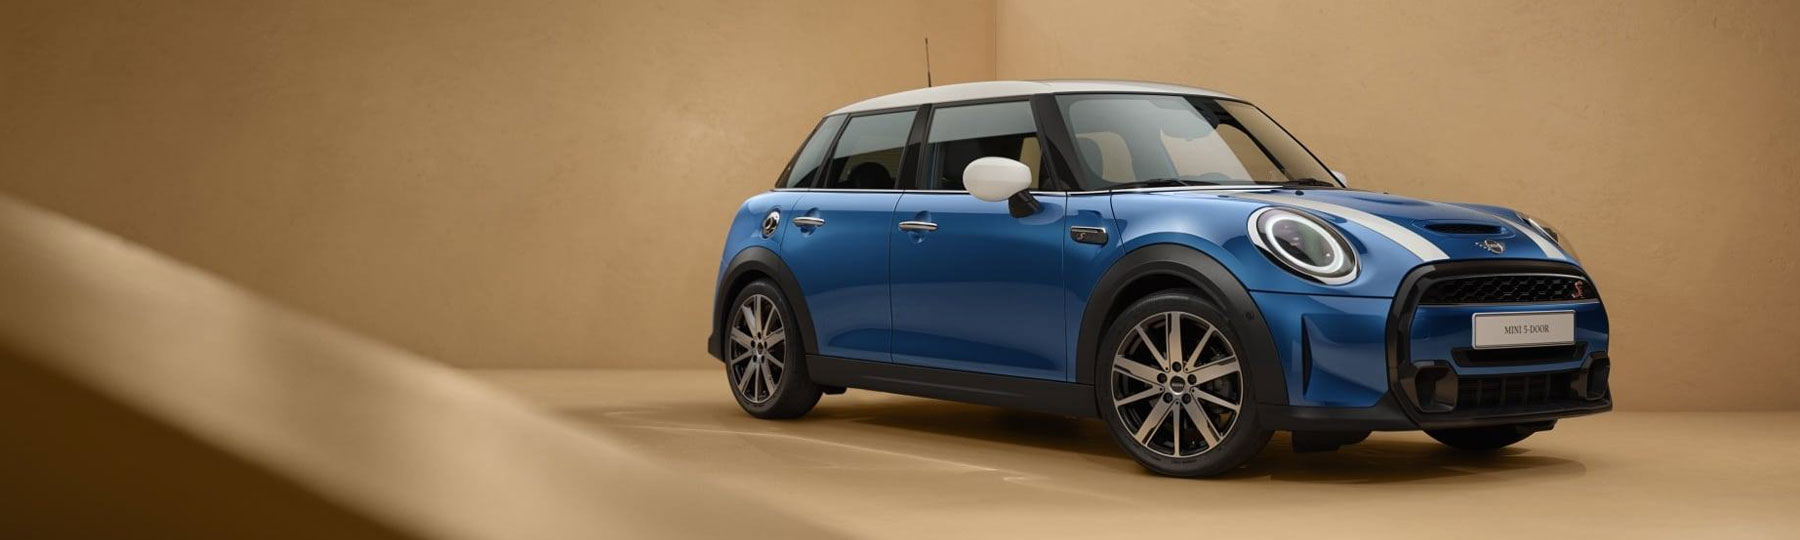 New MINI 5-Door Hatch New Car Offer